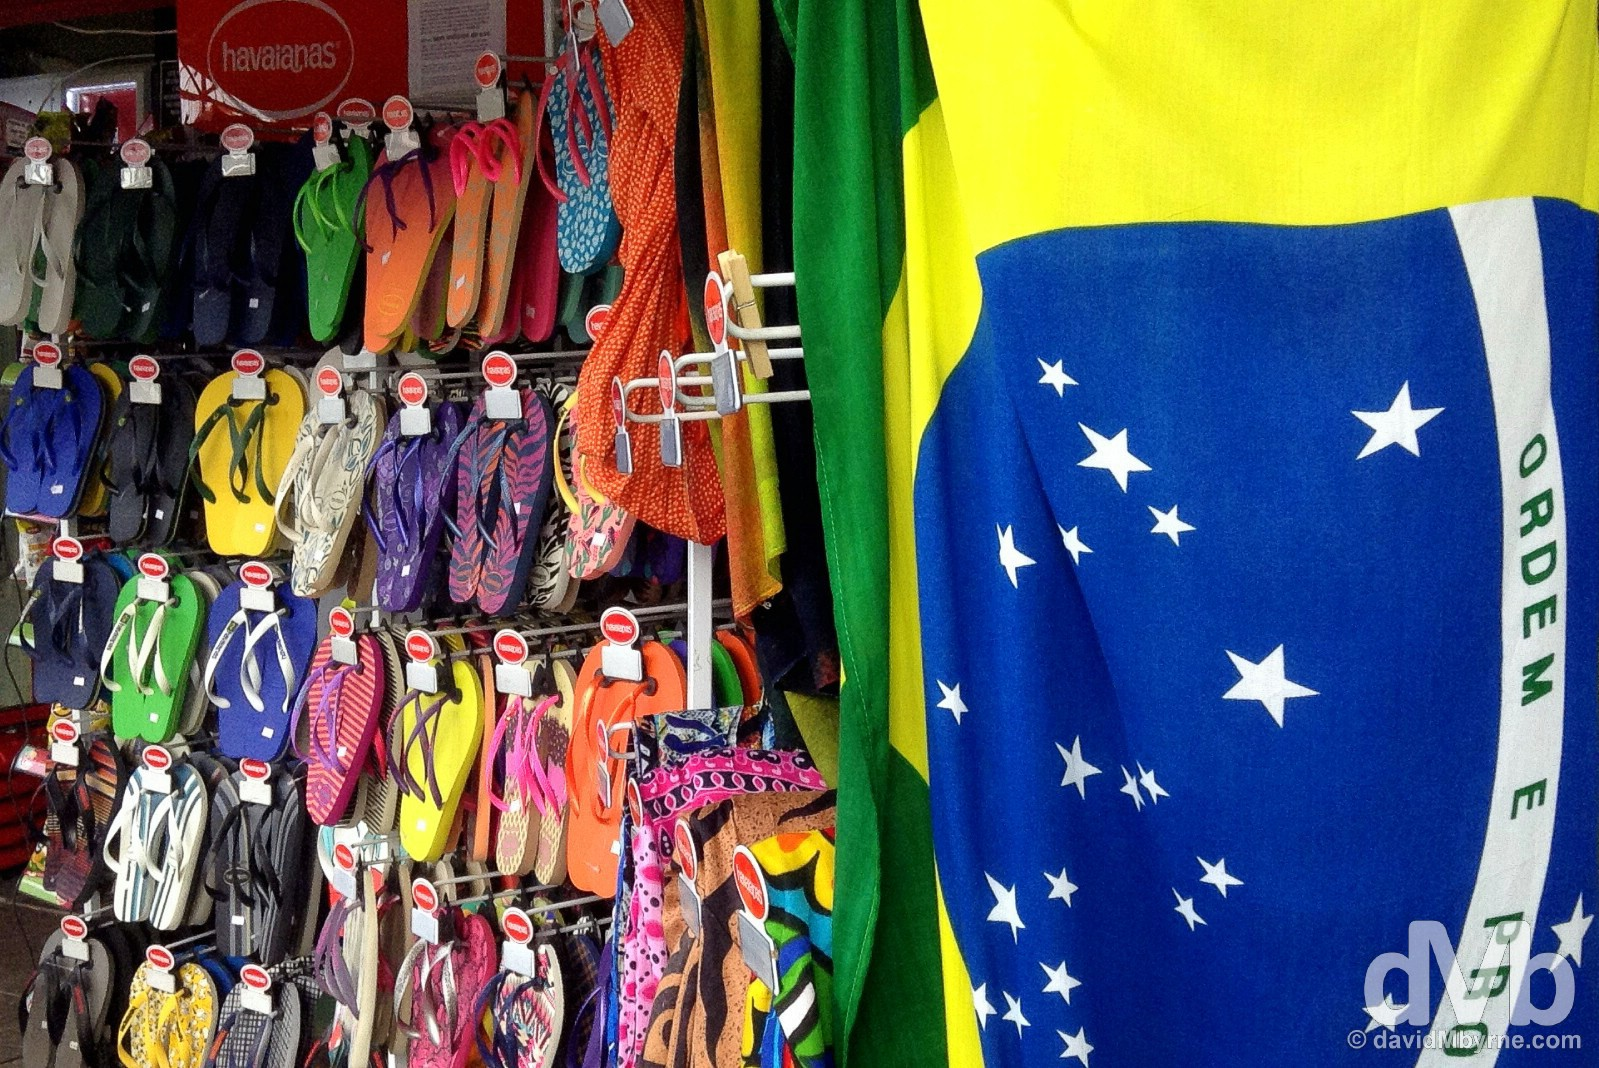 Havaianas for sale in Centrinho da Lagoa on Ilah Santa Catarina, Brazil. September 16, 2015.